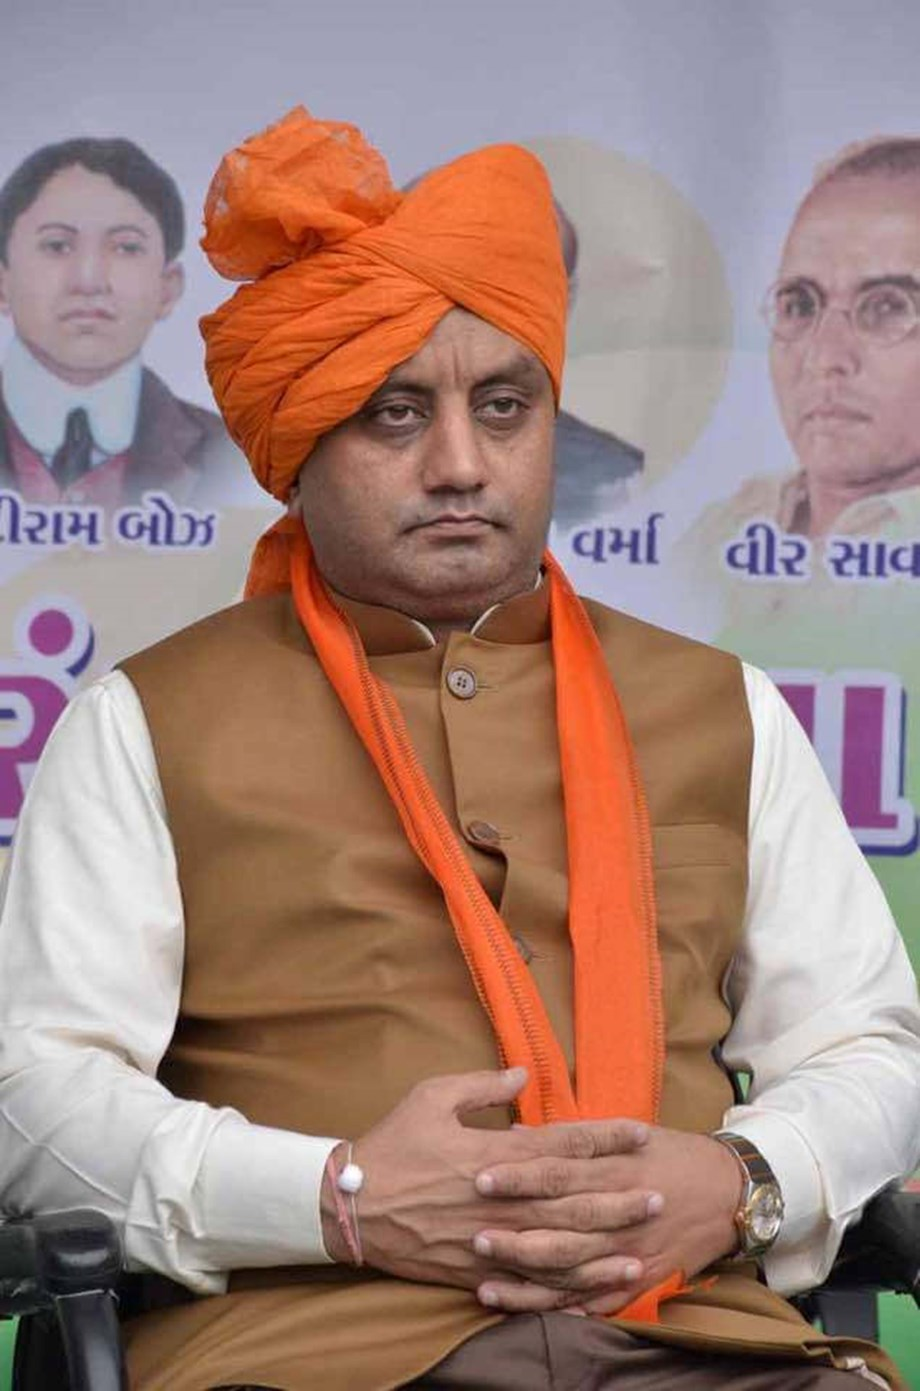 BJP LS candidates would be finalized based on winnability: Sudhanshu Trivedi